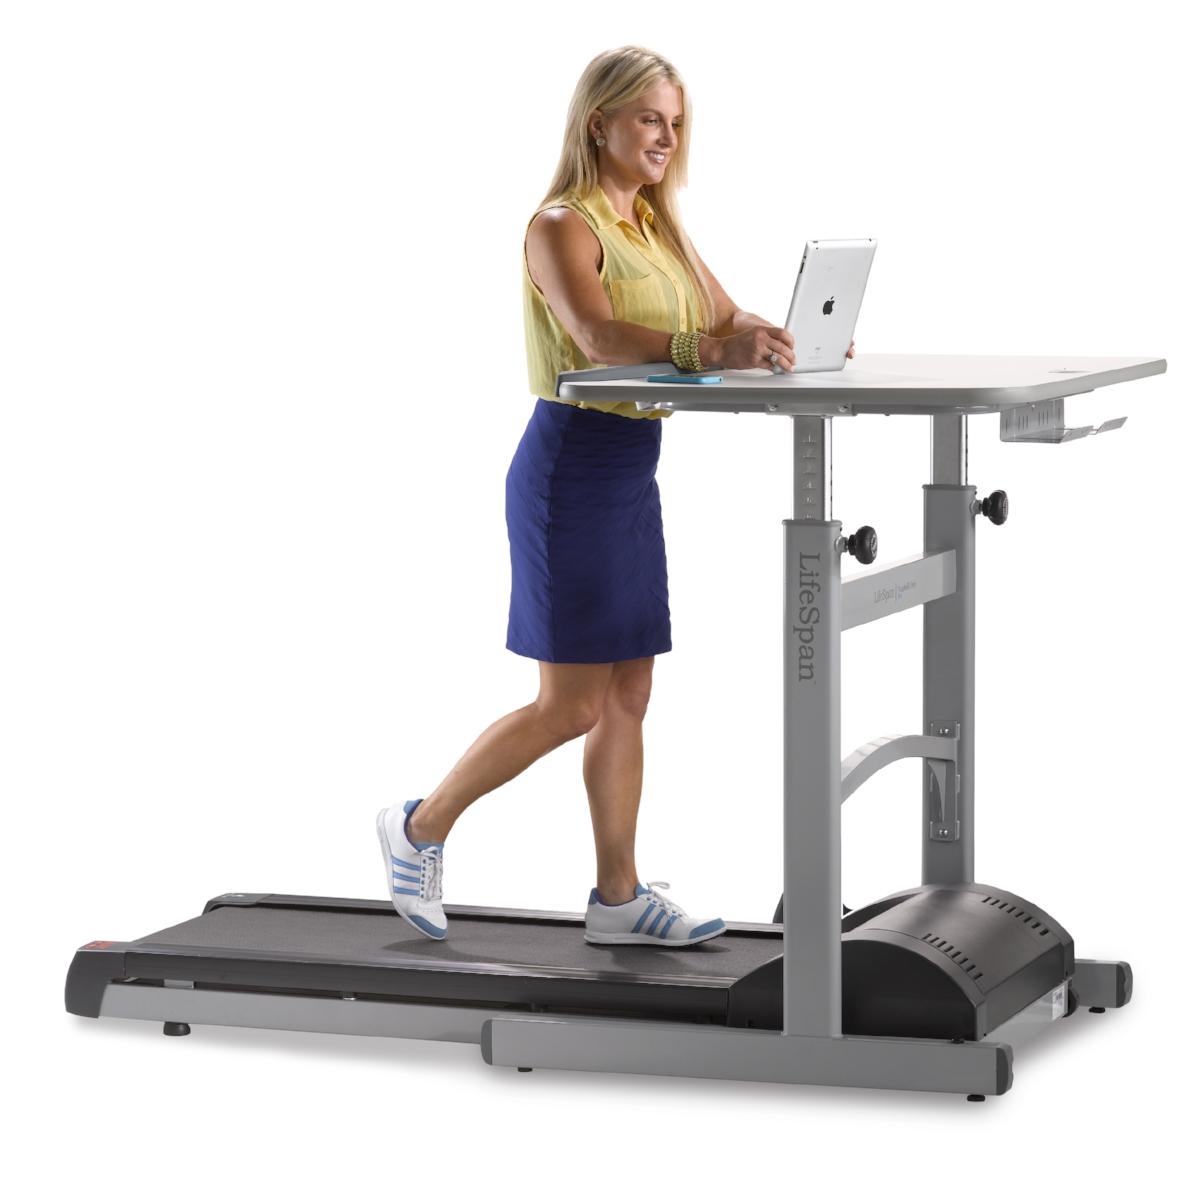 LifeSpan-Treadmill-Desk_Female_72dpi.jpg